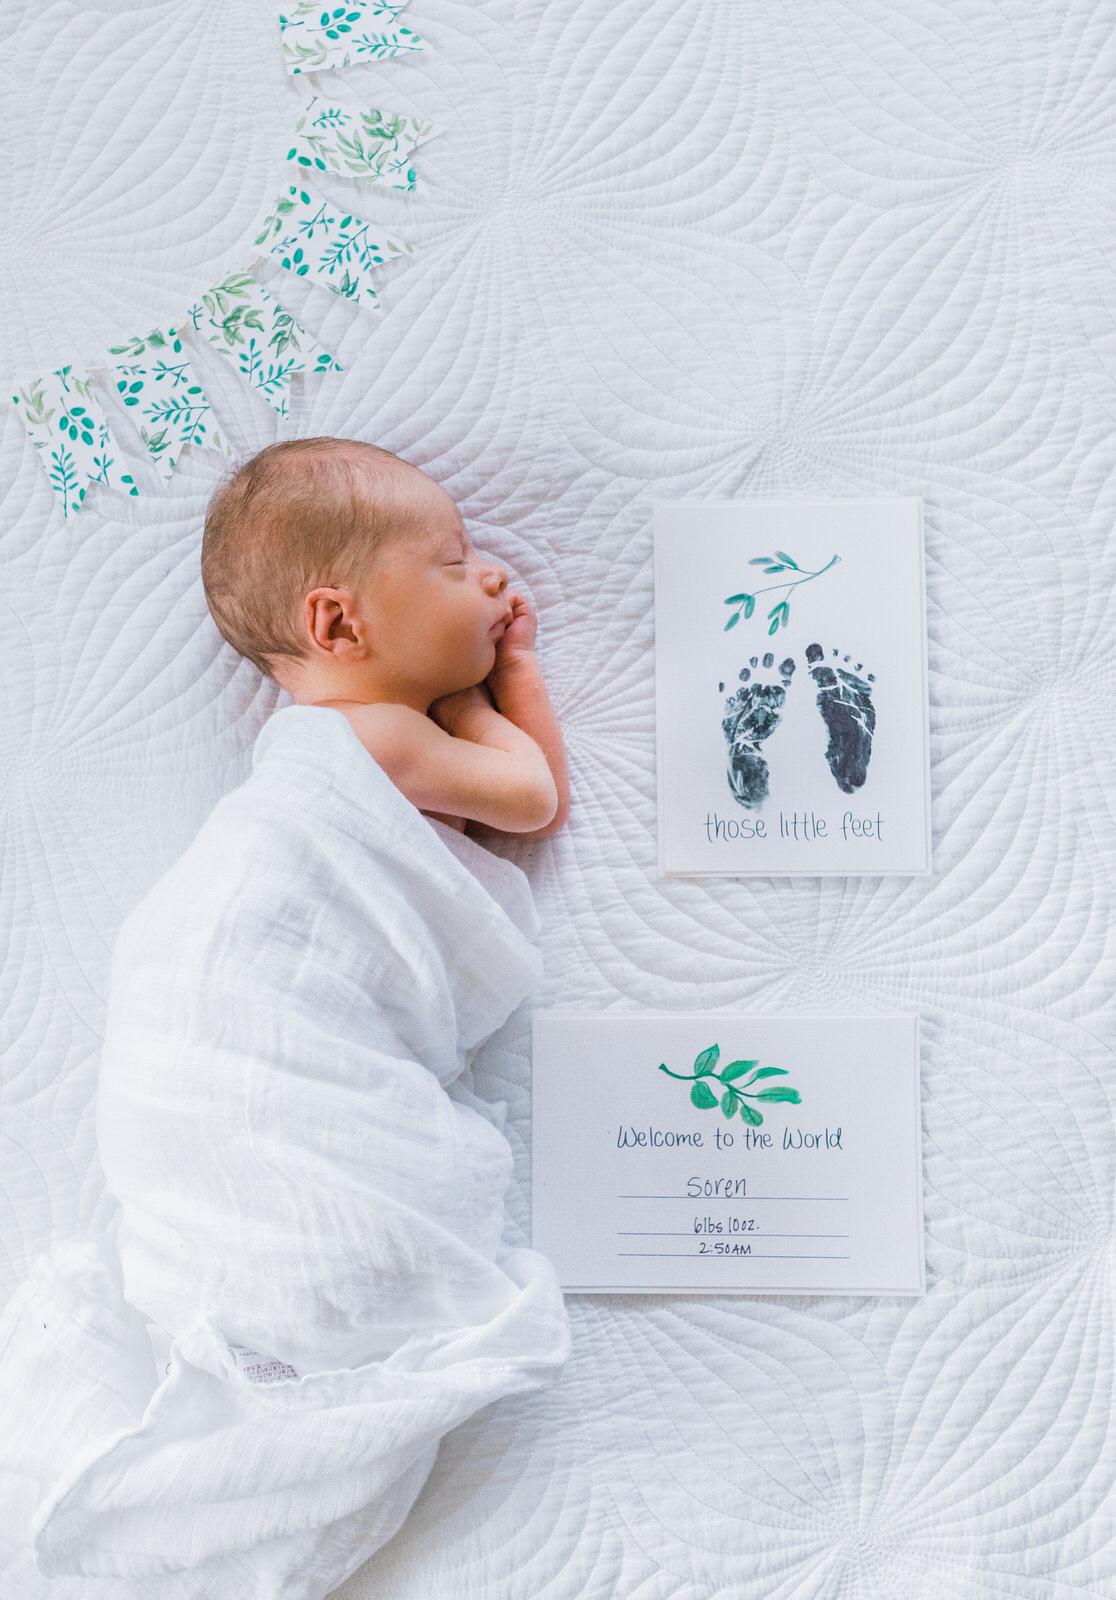 small-business-nursery-newborn-photographer-5376.jpg